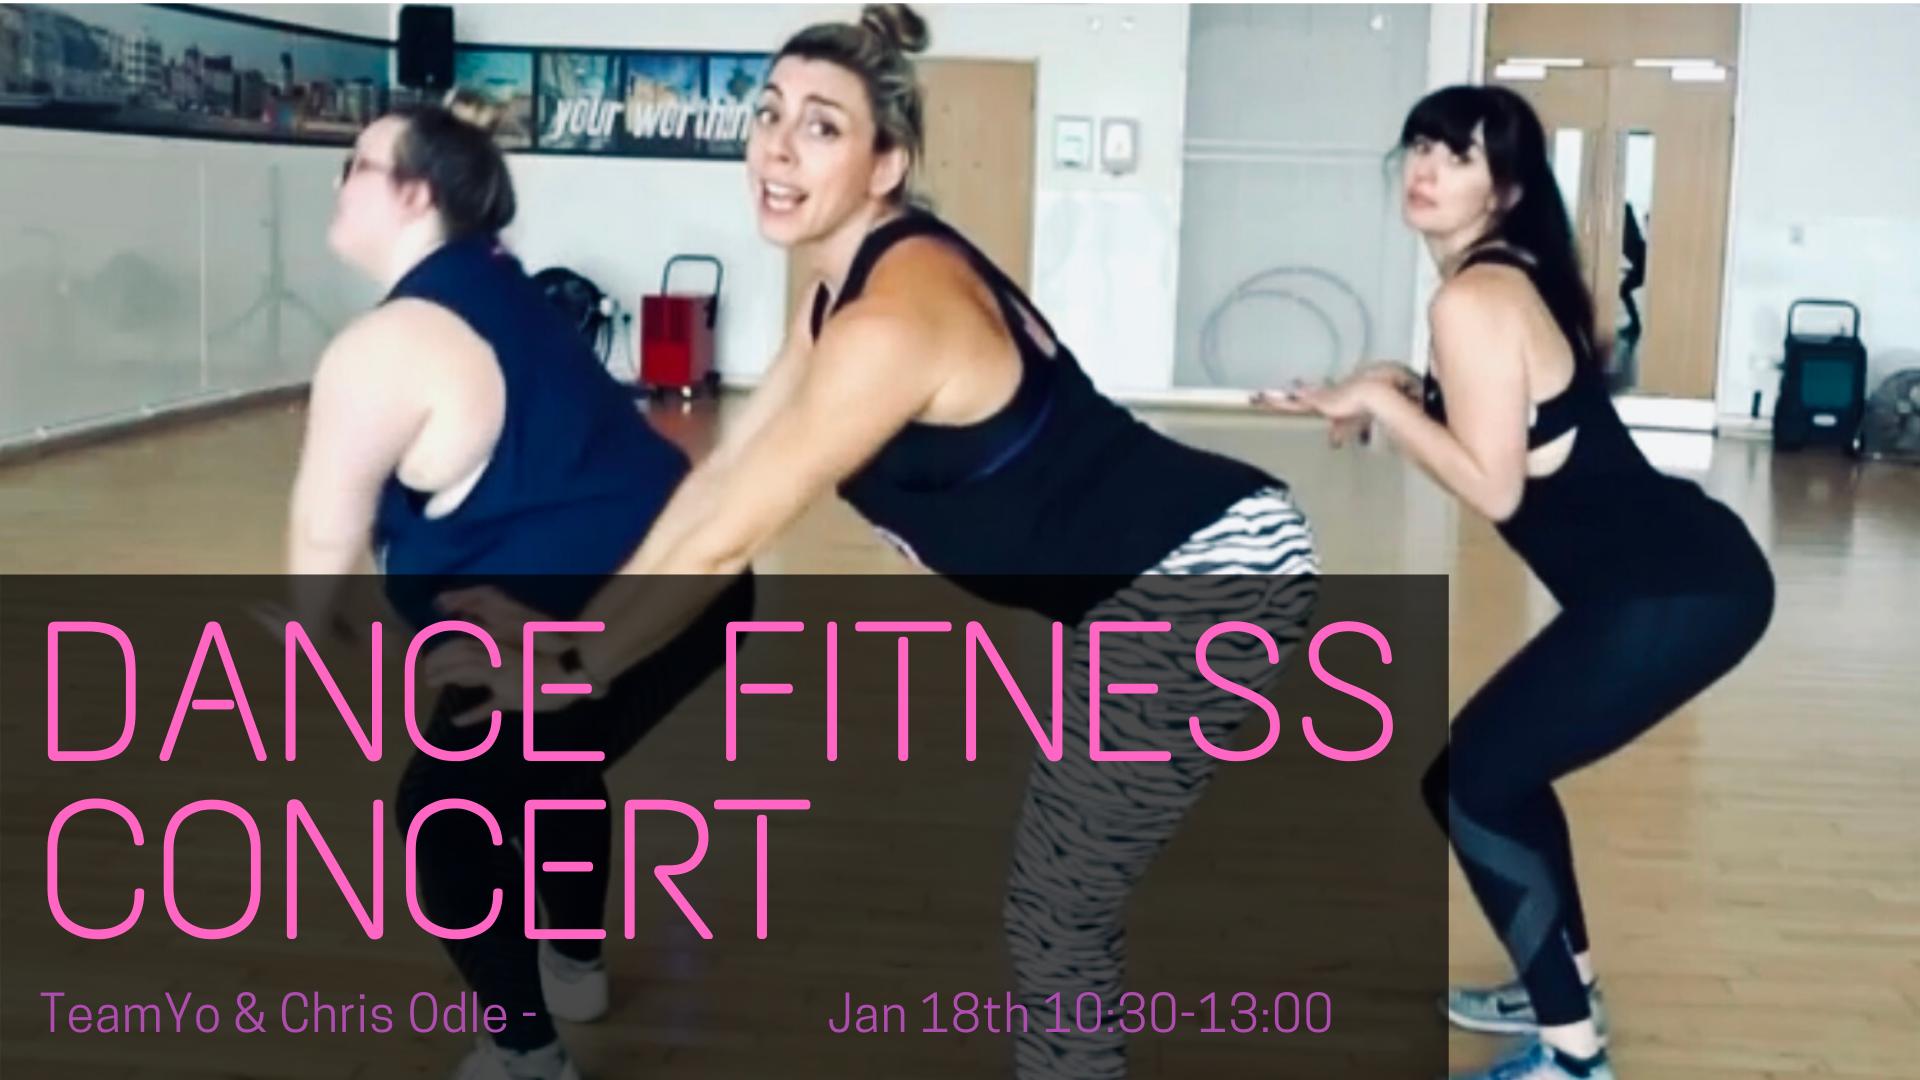 Dance fitness concert